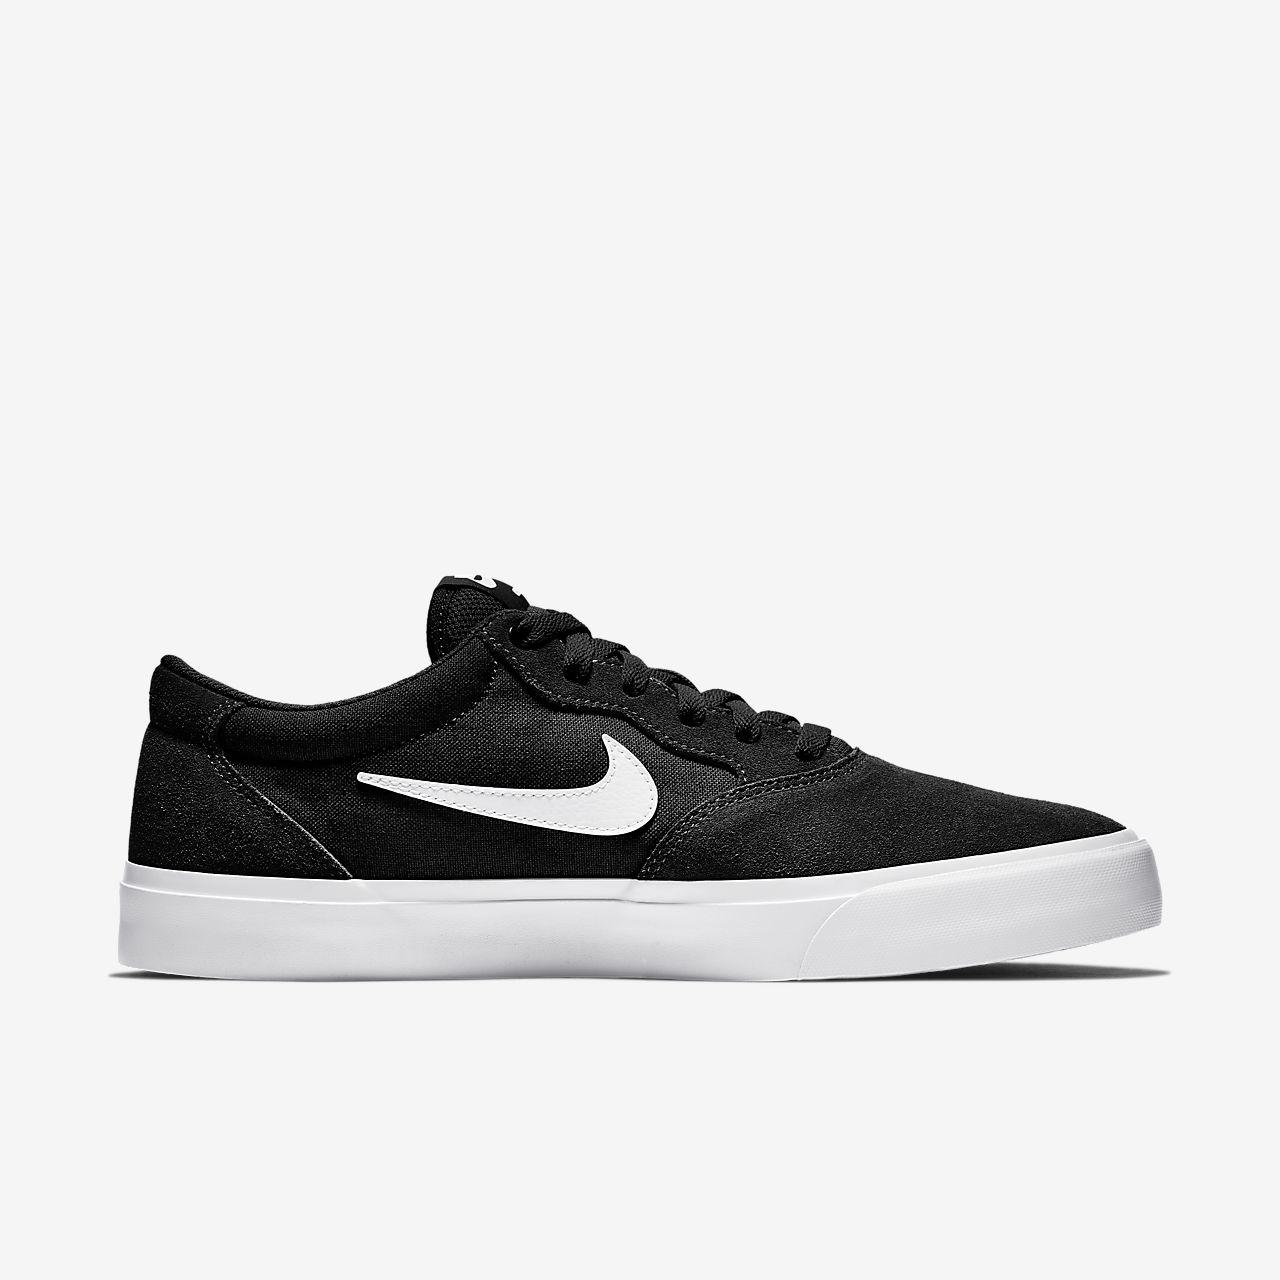 Nike SB Check Solar Canvas Men's Skate Shoes